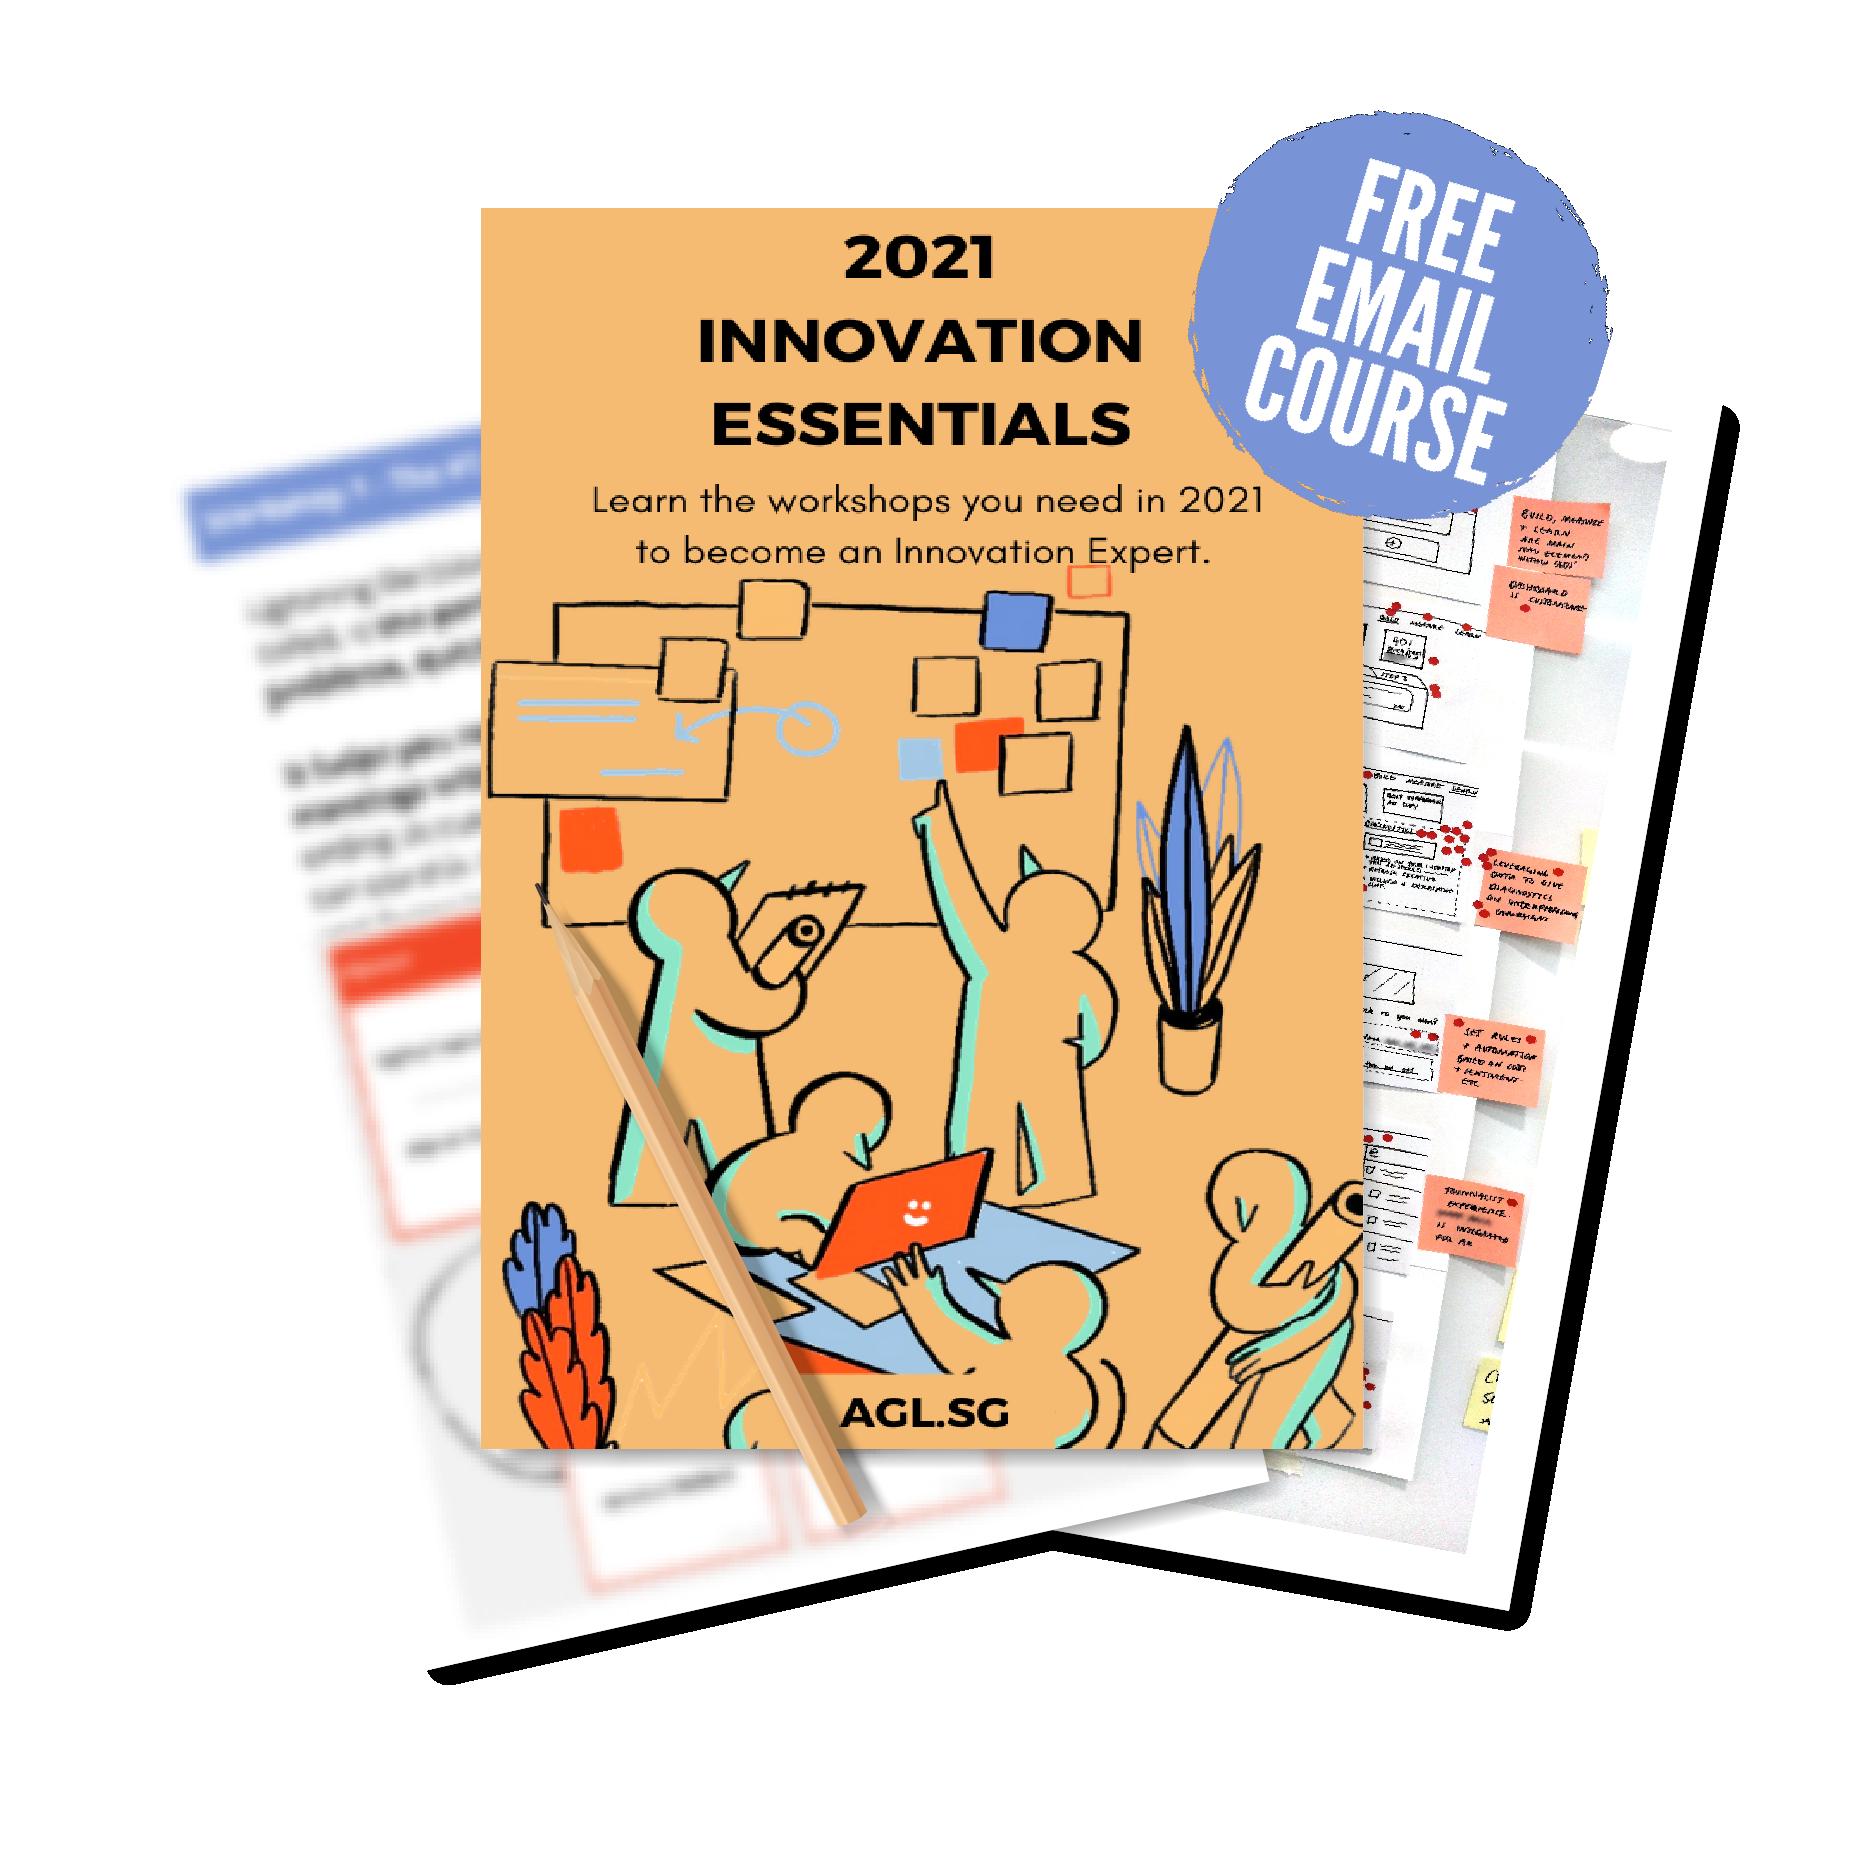 agl-design-innovation-e-mail-course